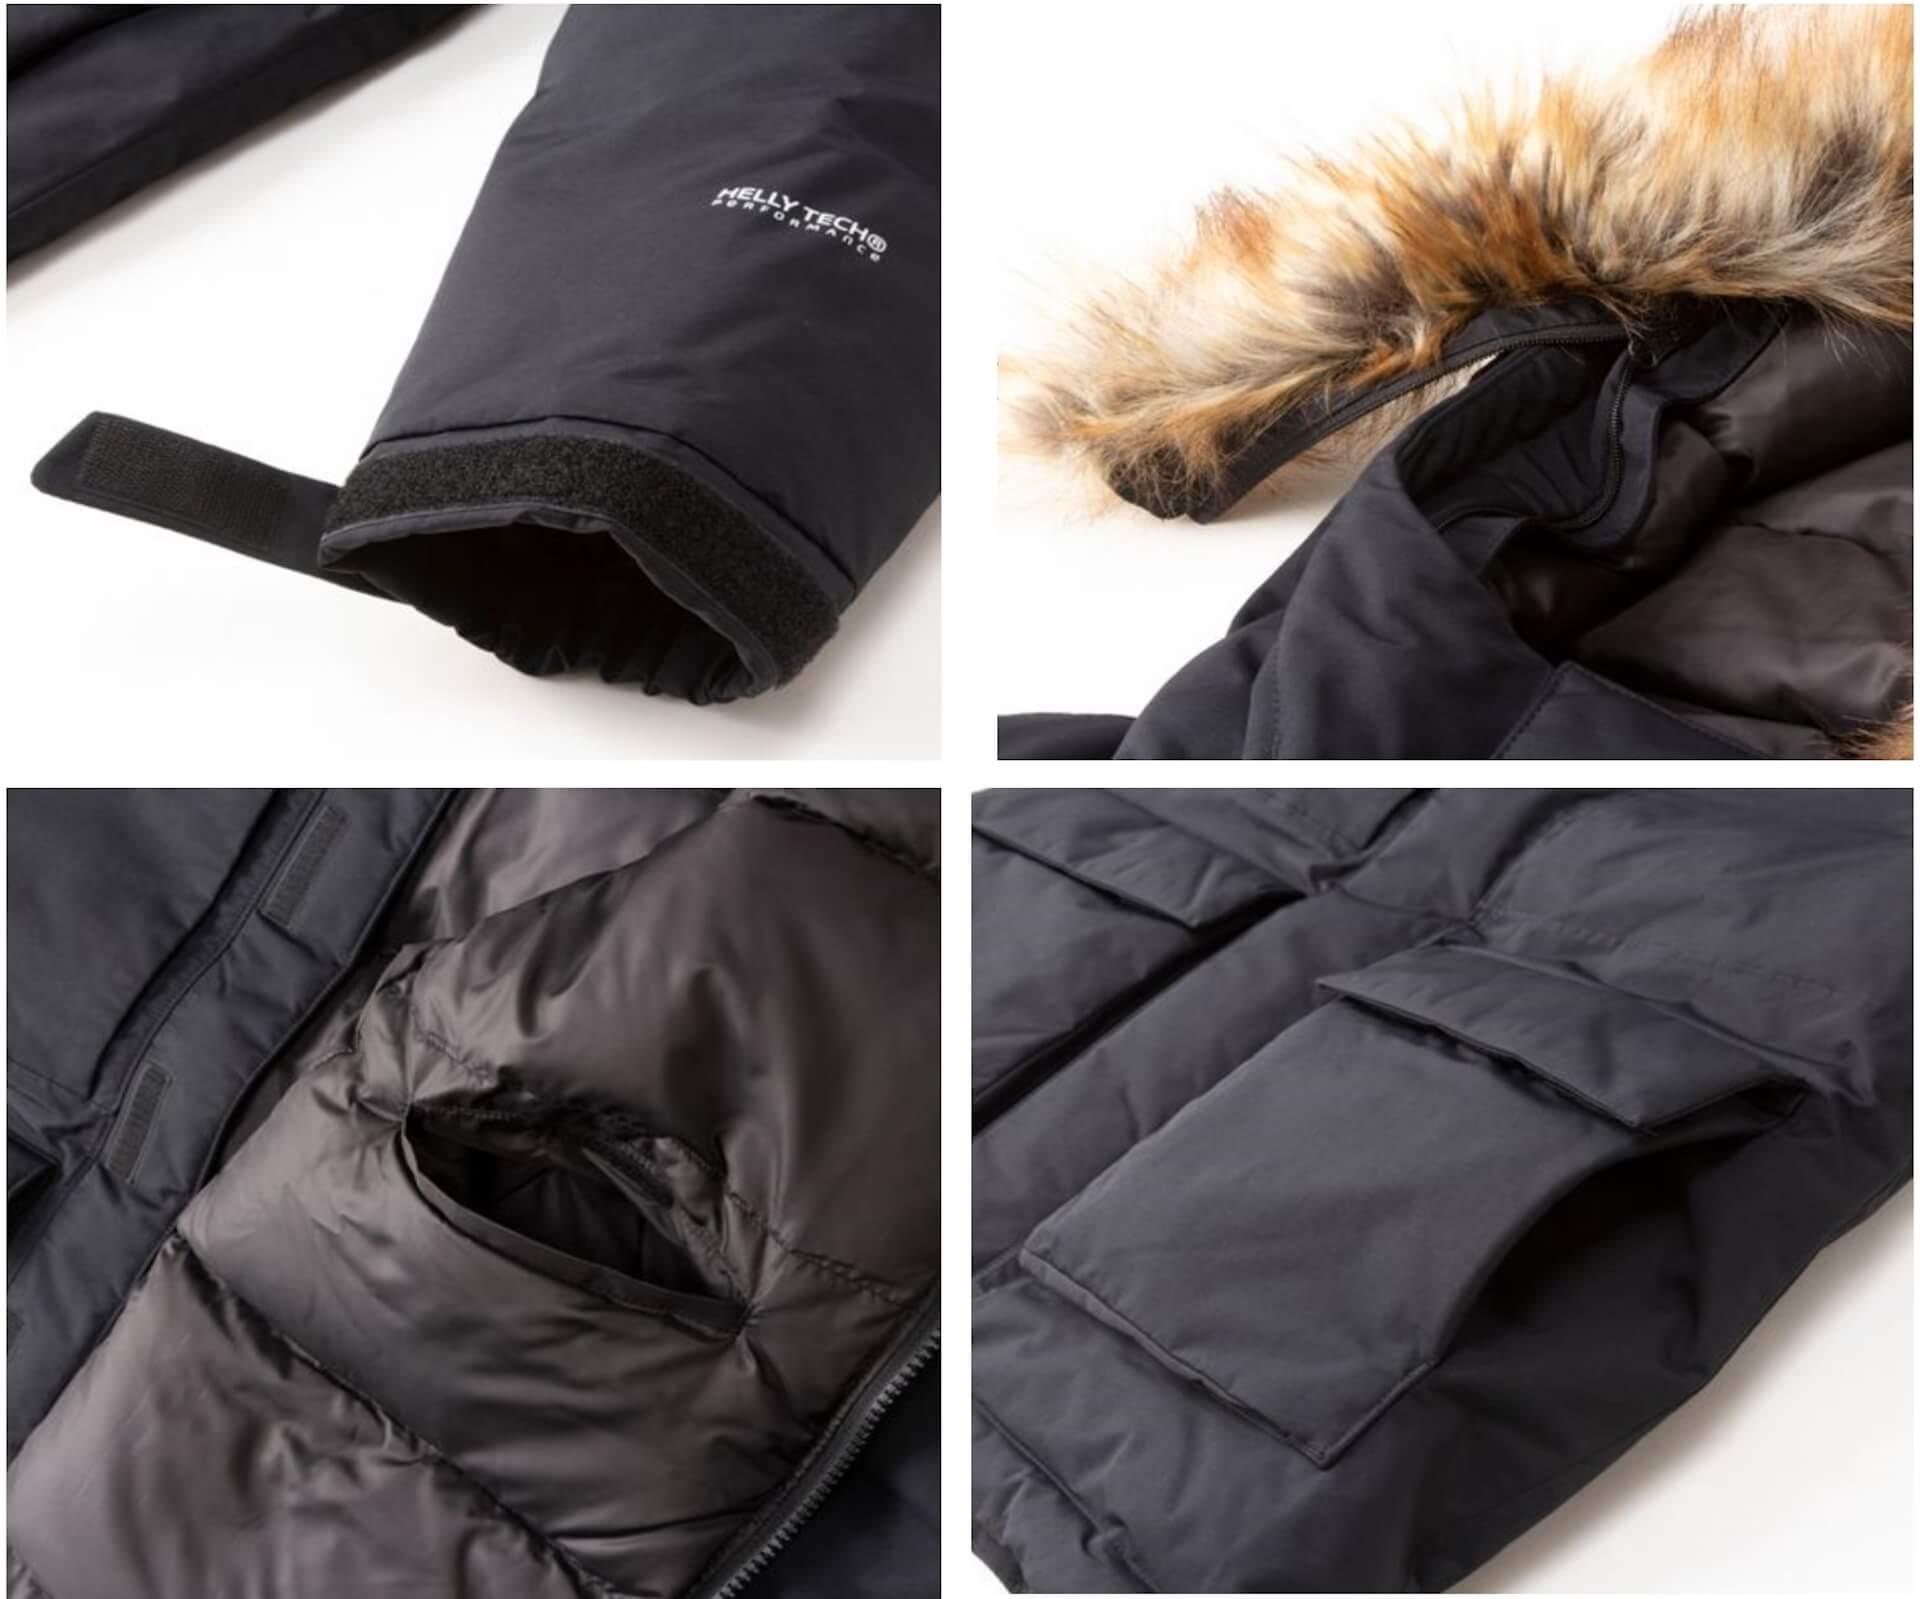 HELLY HANSENから防水透湿性を兼ね備えたハイロフトダウン『Hemsedal Jacket』&『Mager Insulation Jacket』が登場! fashion201215_hellyhansen_down_5